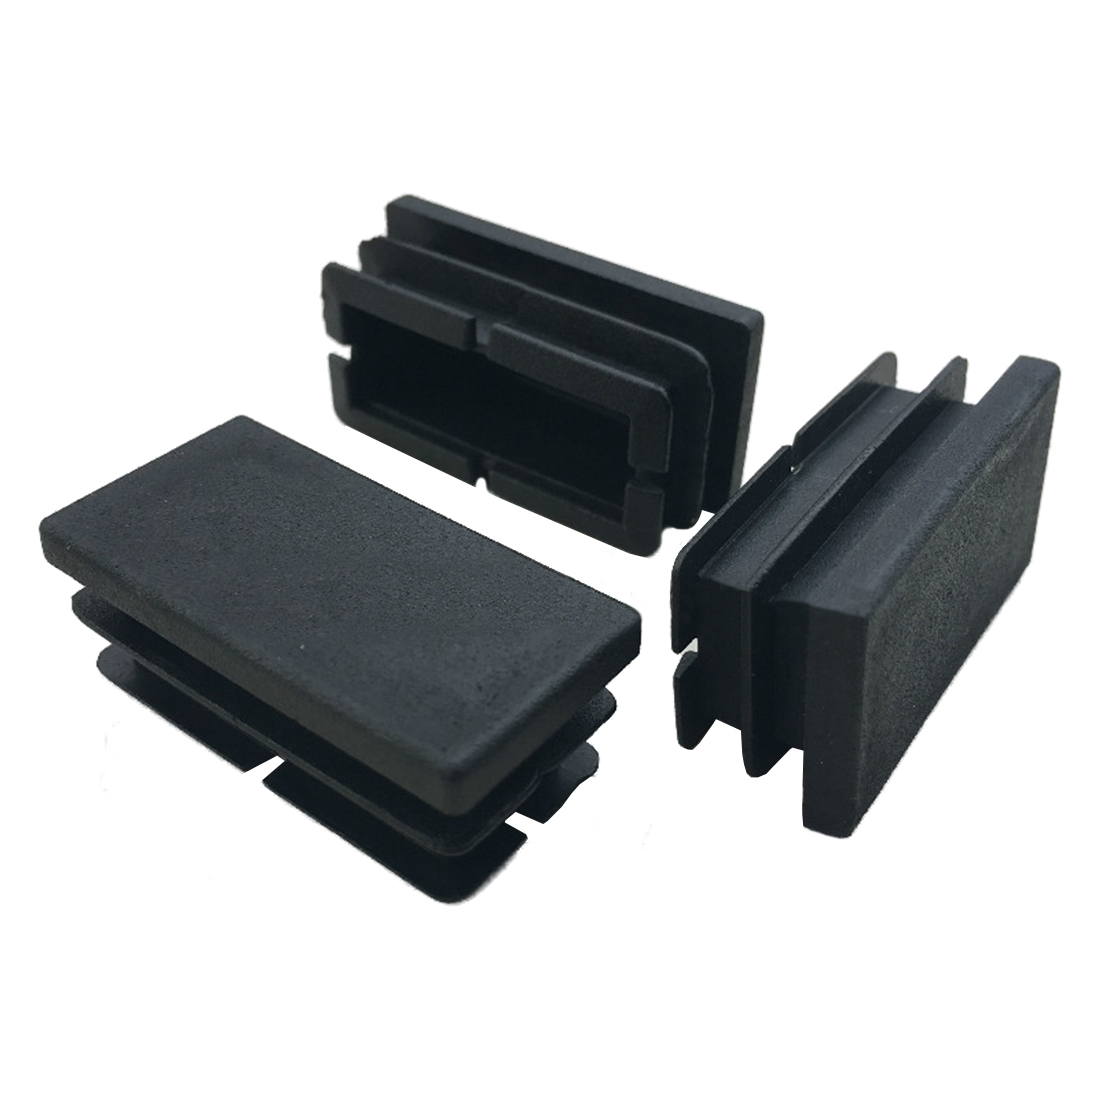 8 Pcs Black Plastic Rectangular Blanking End Caps Inserts 20mm x 40mm8 Pcs Black Plastic Rectangular Blanking End Caps Inserts 20mm x 40mm